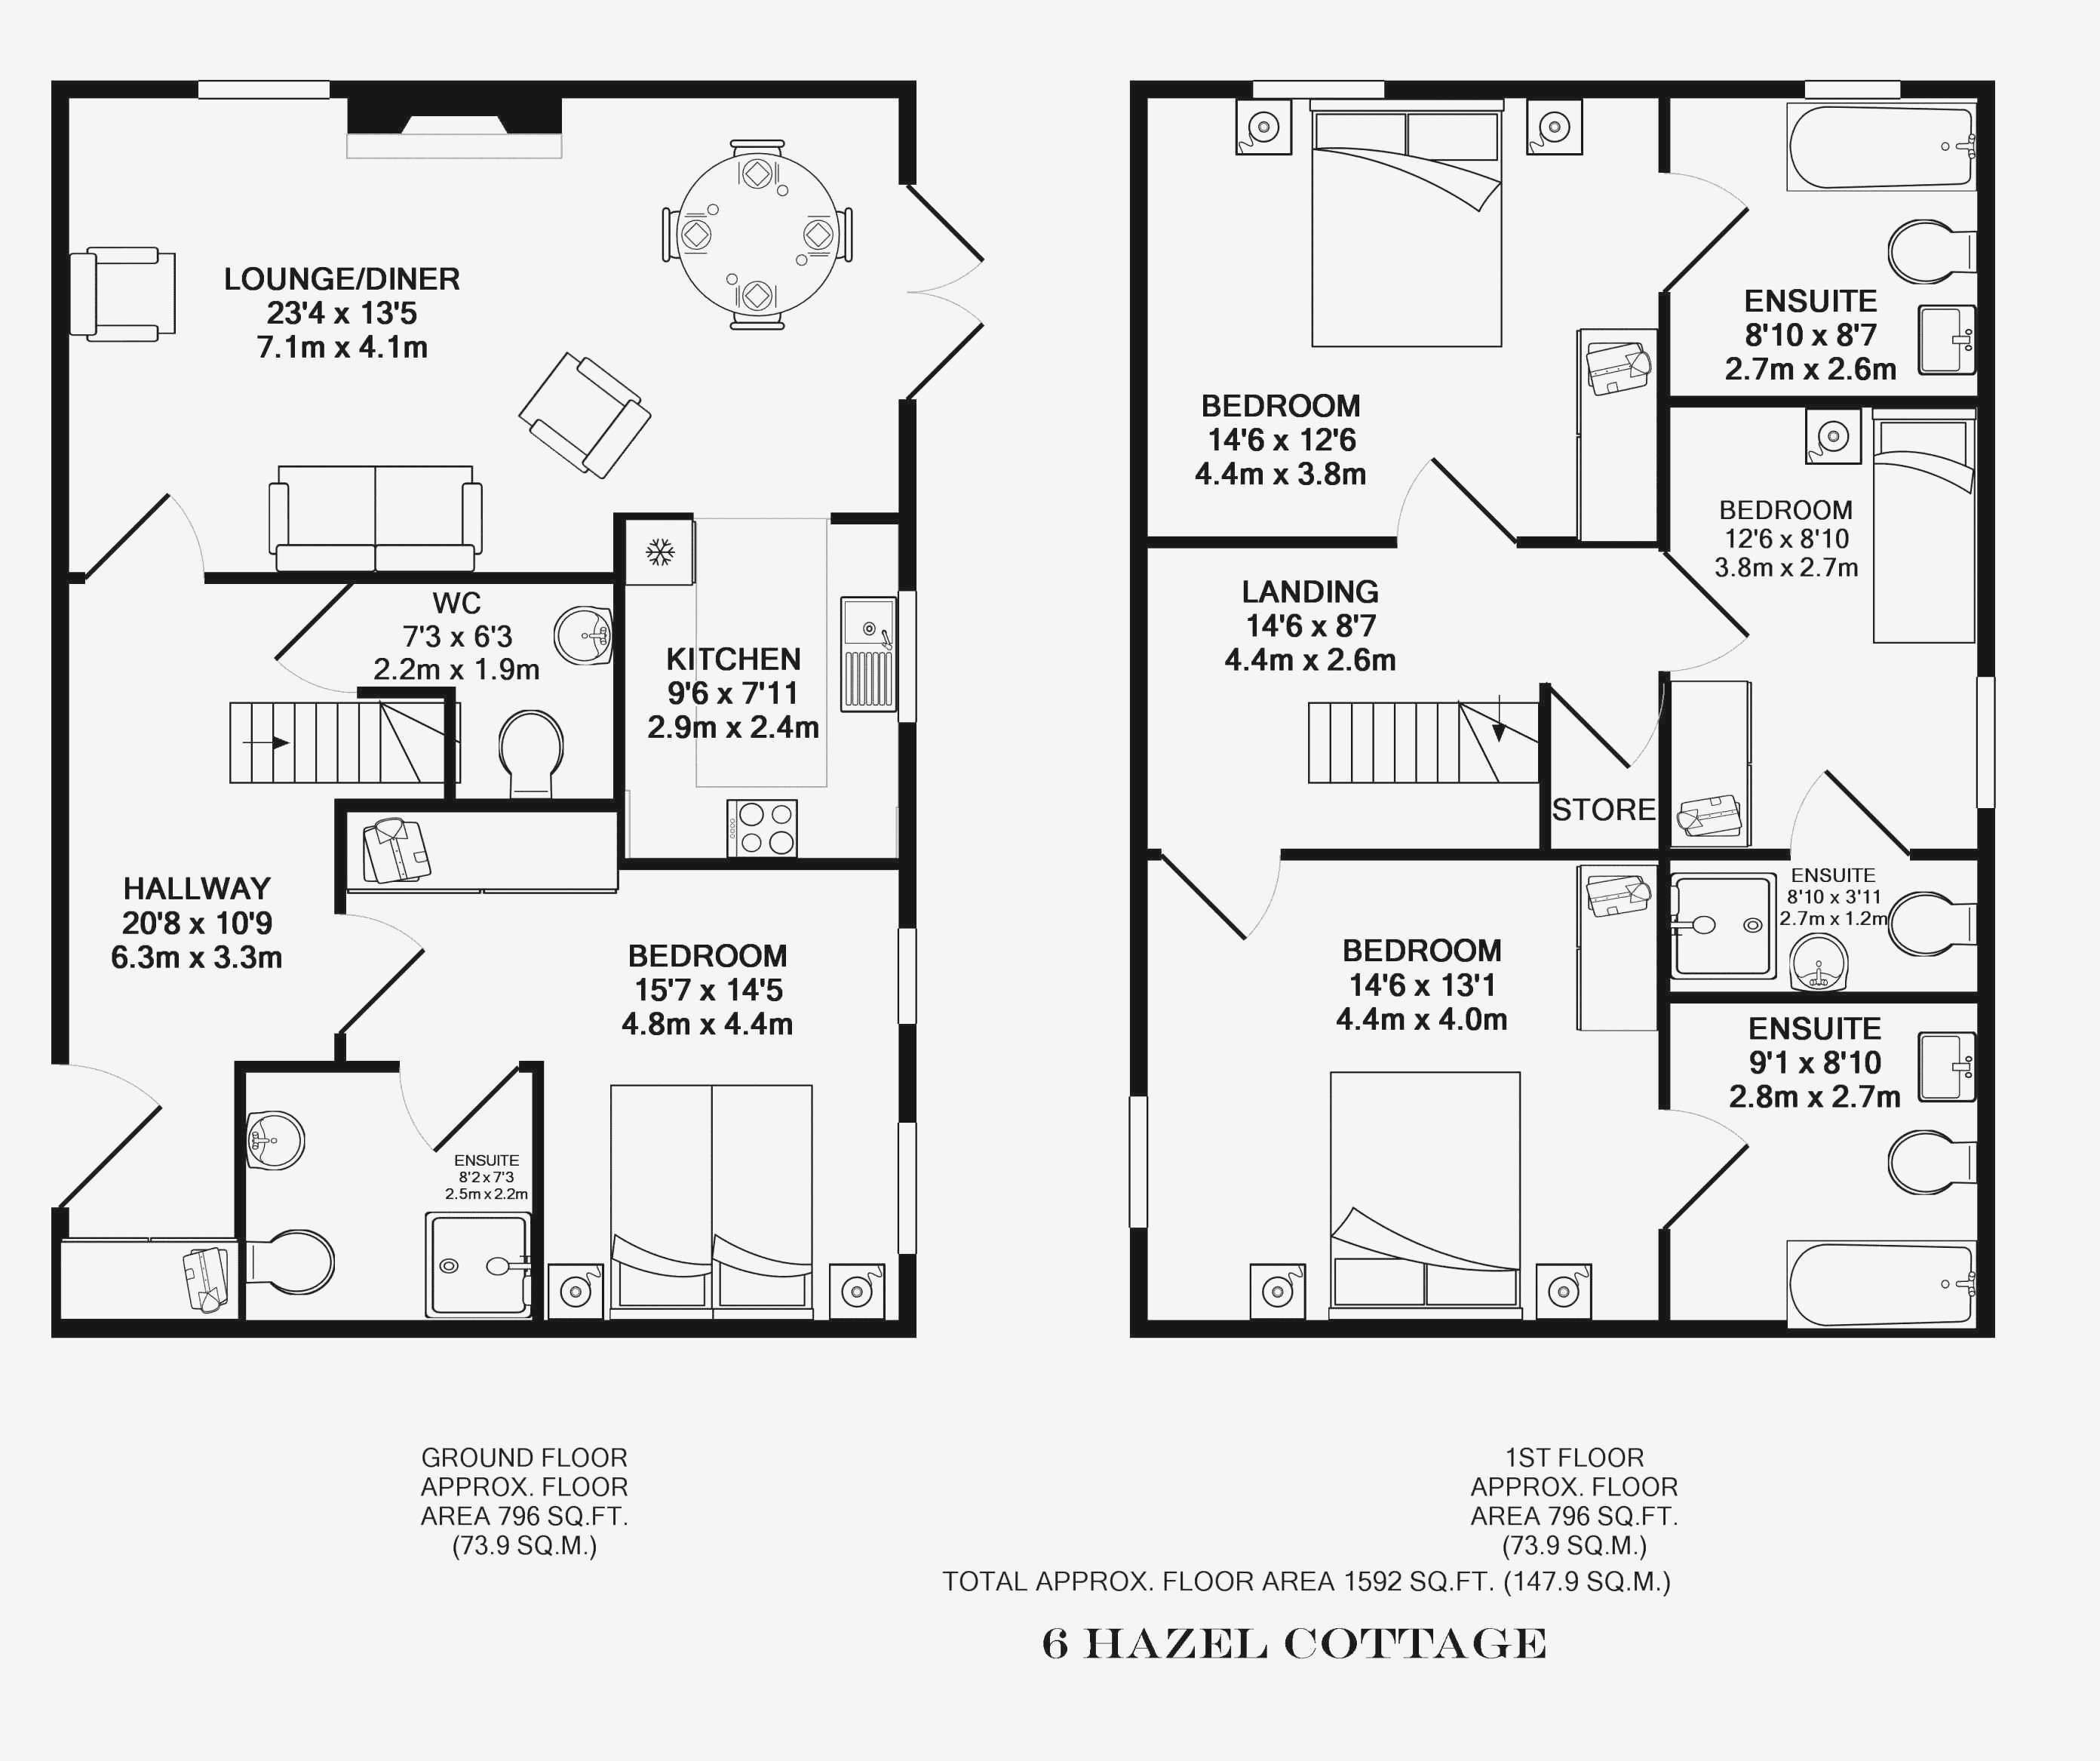 Master Bedroom Ensuite Floor Plans Regarding House - House Plans